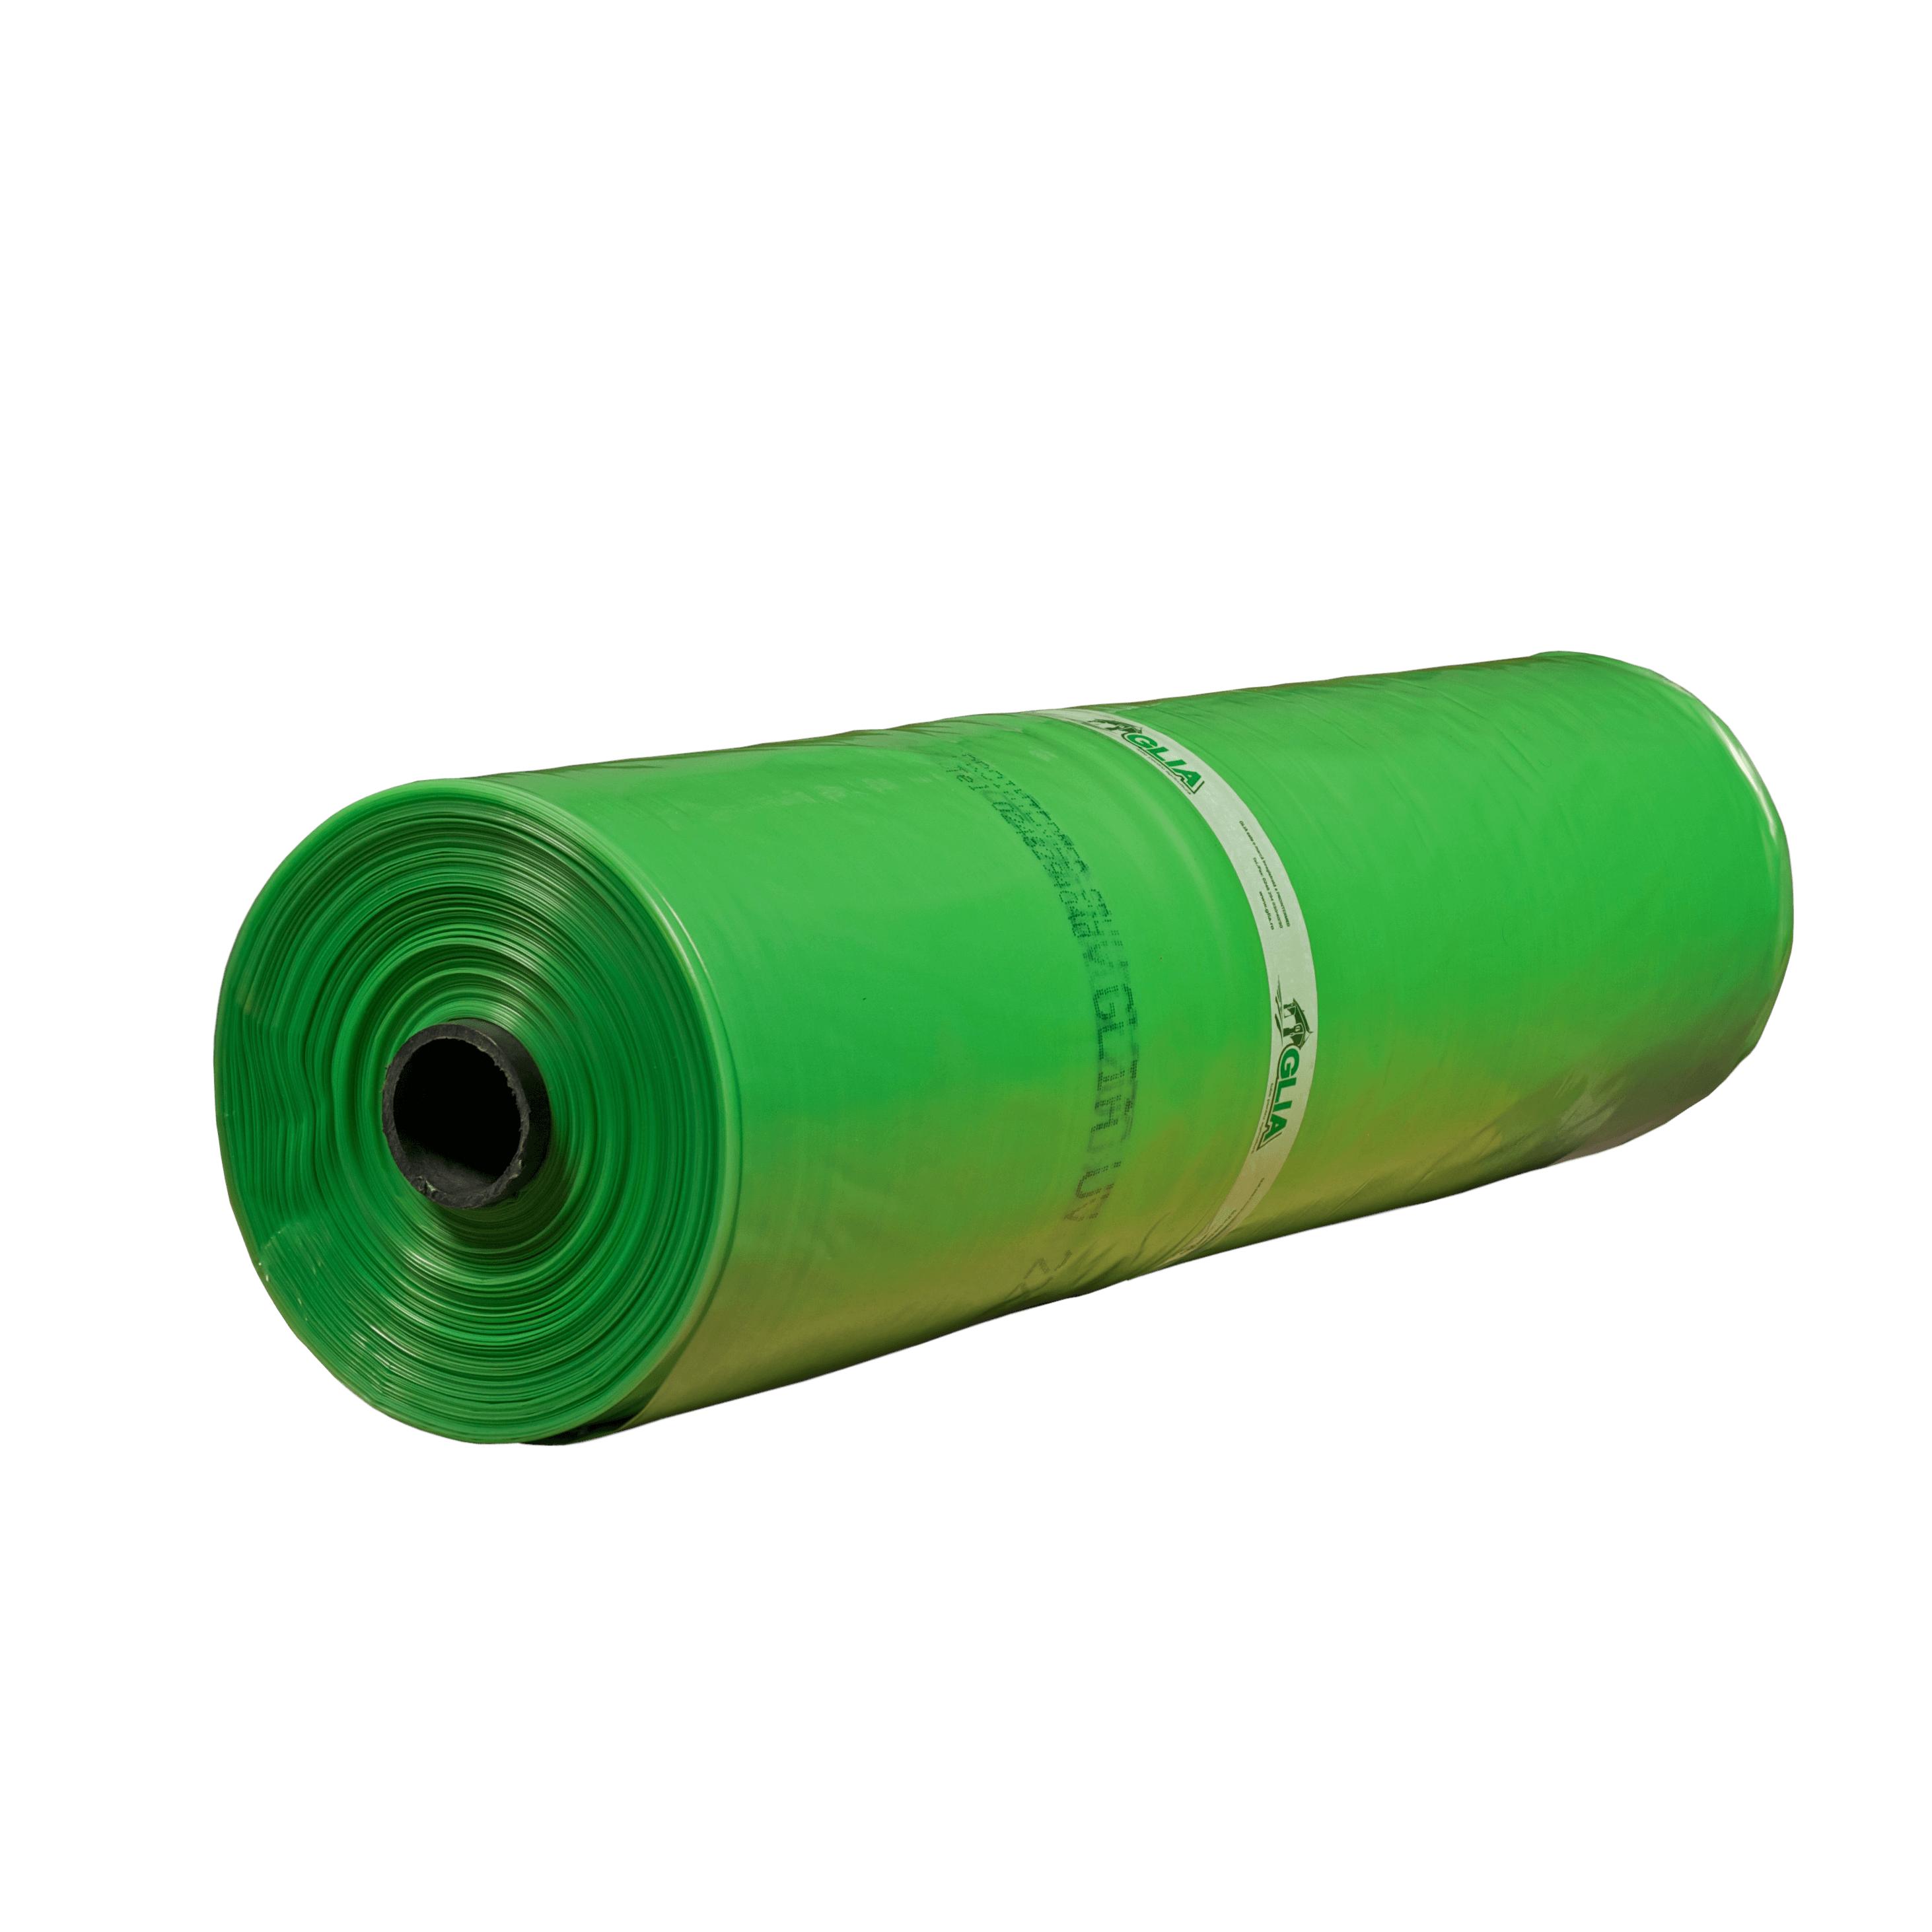 Folie polietilena Glia UV, 0,15 mm grosime, PE natur, verde, rezistenta UV 36 luni, 4,20 m latime mathaus 2021